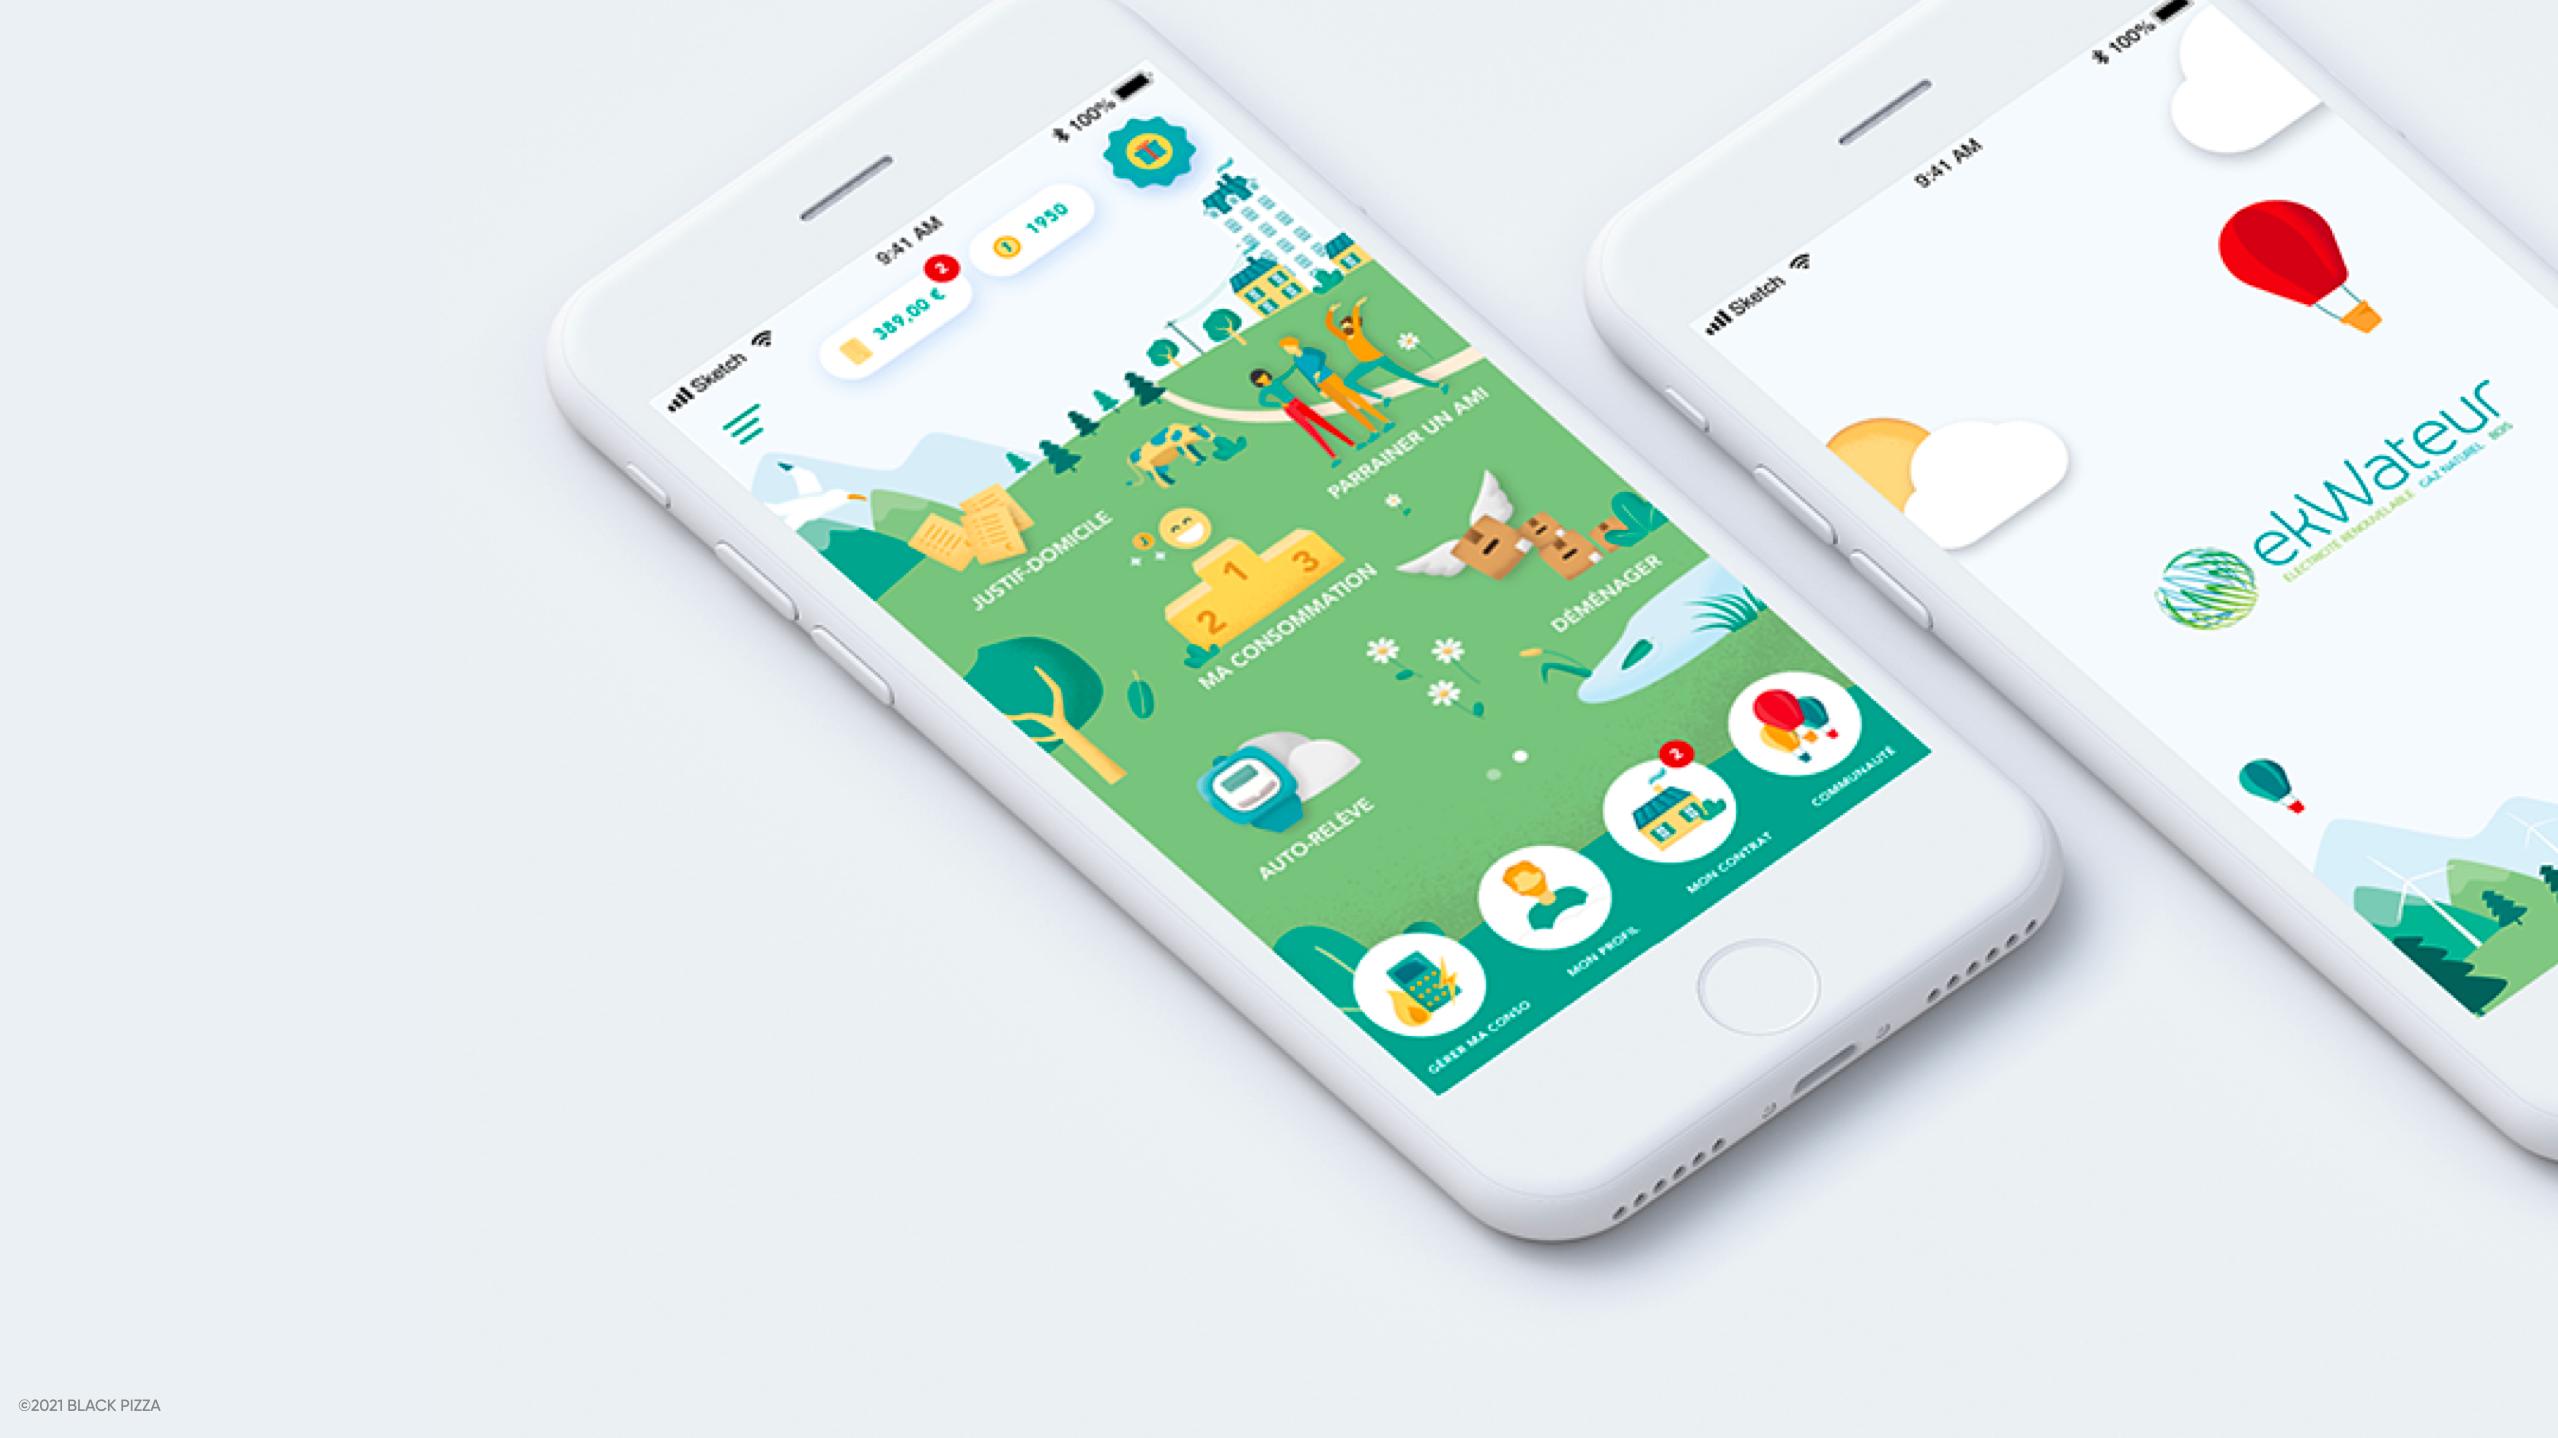 ekWateur   Application mobile - Application mobile